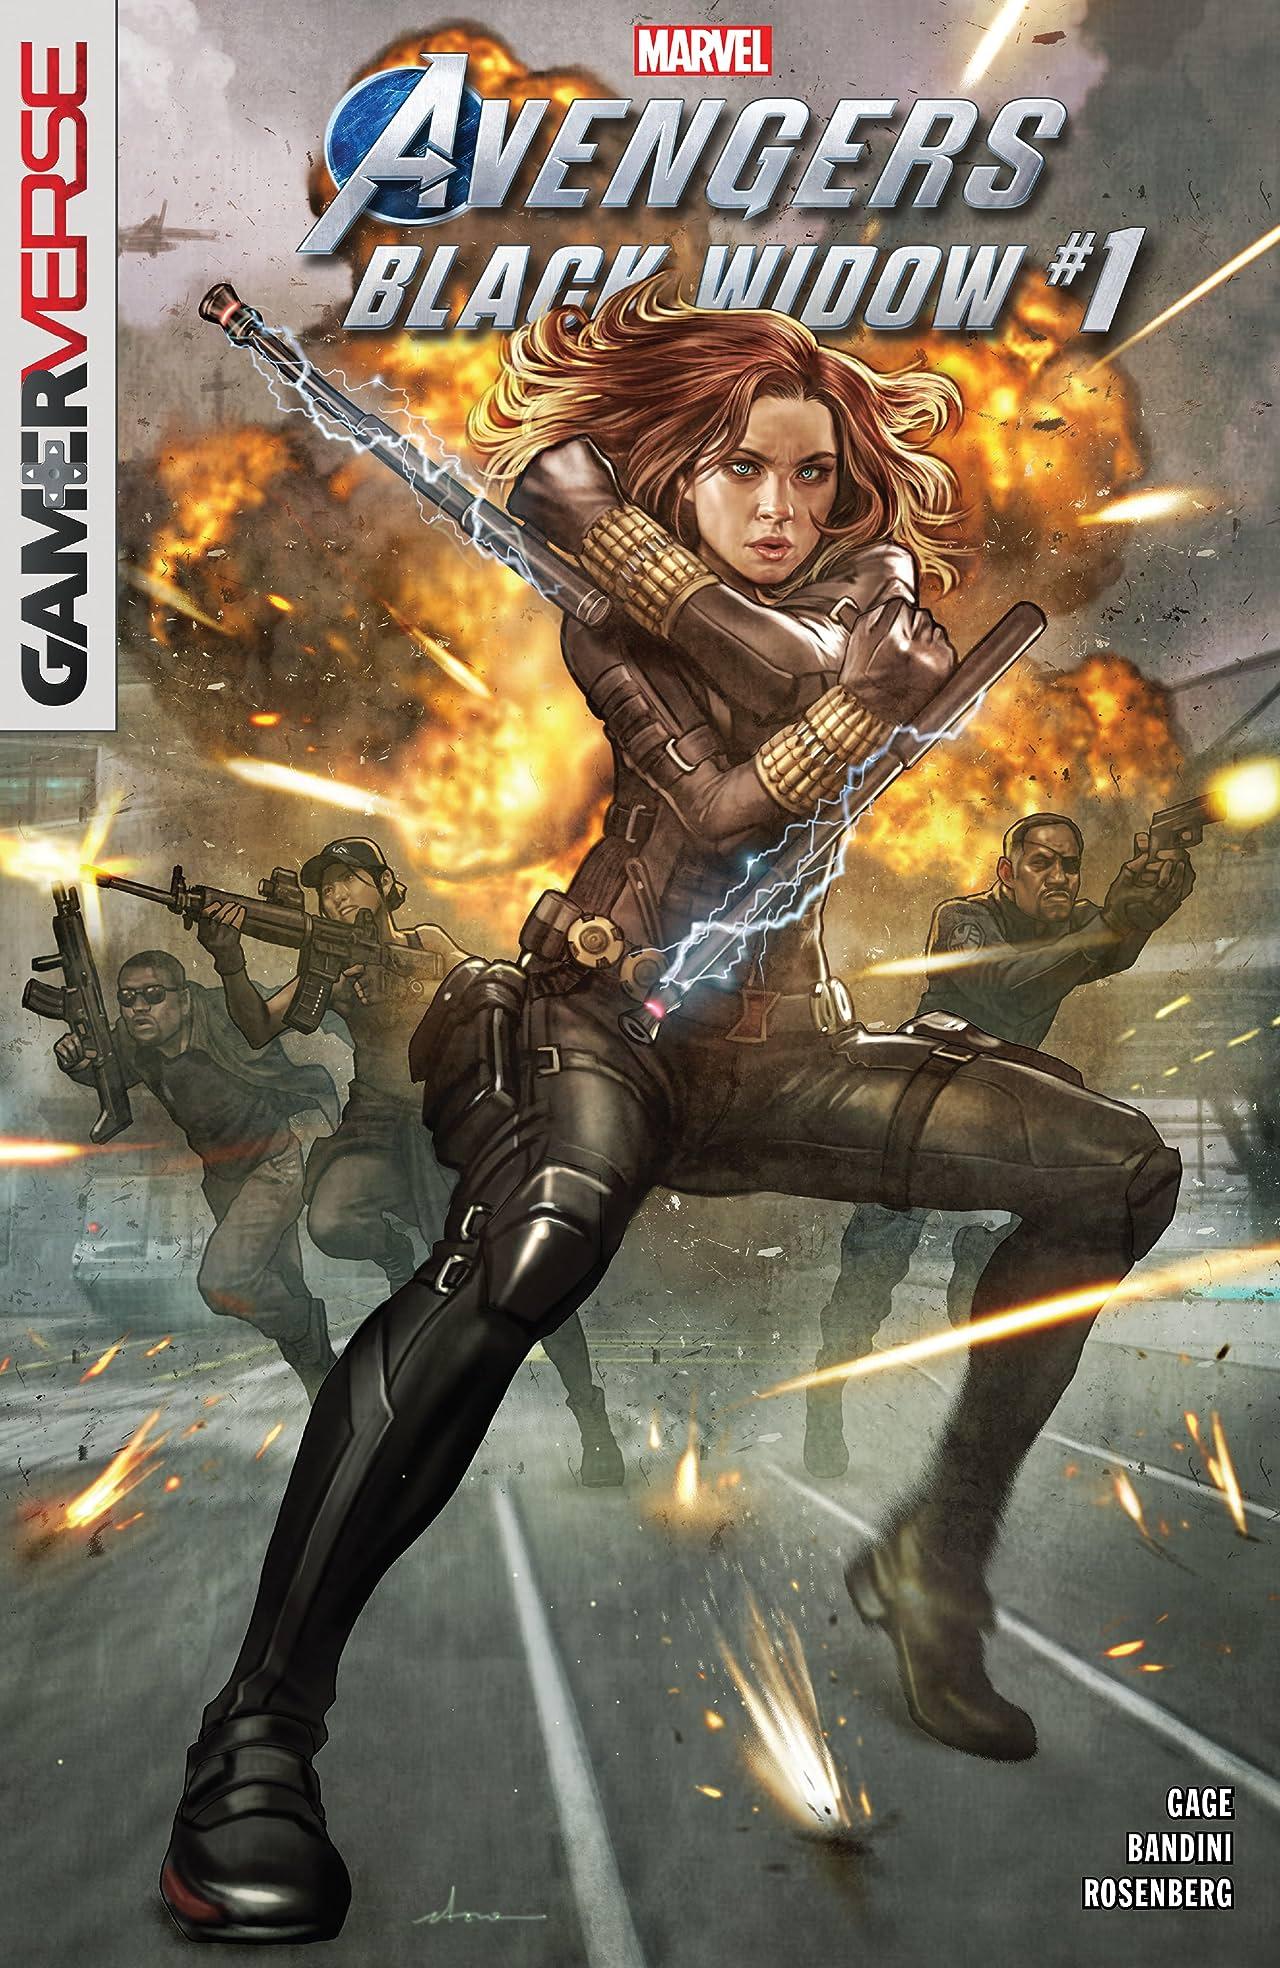 Marvel's Avengers: Black Widow (2020) #1